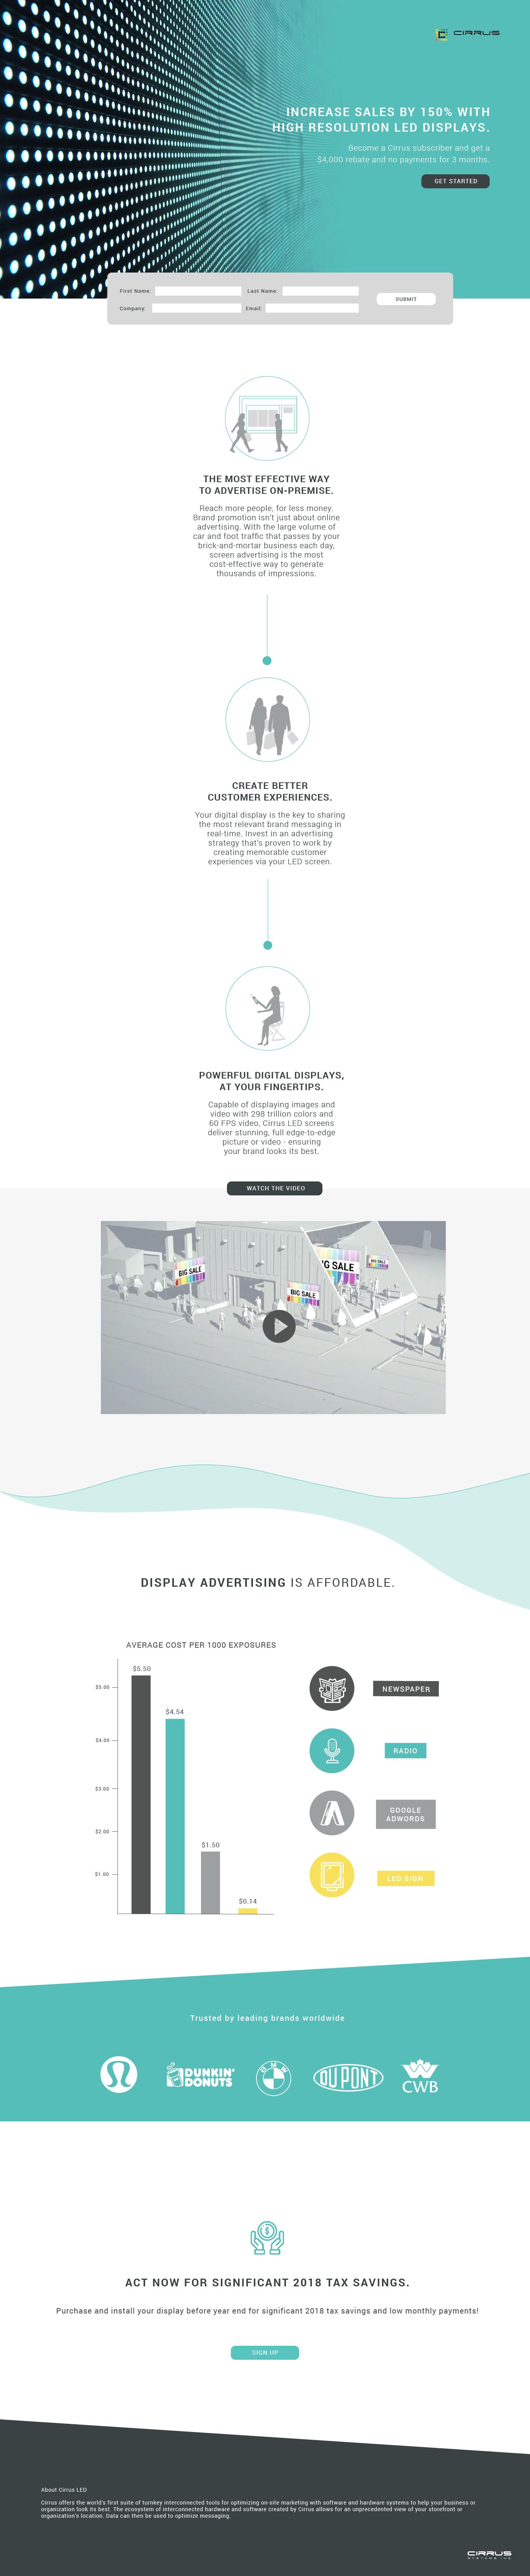 Cirrus-Marketing-Campaign-Landing-Page-V2.jpg